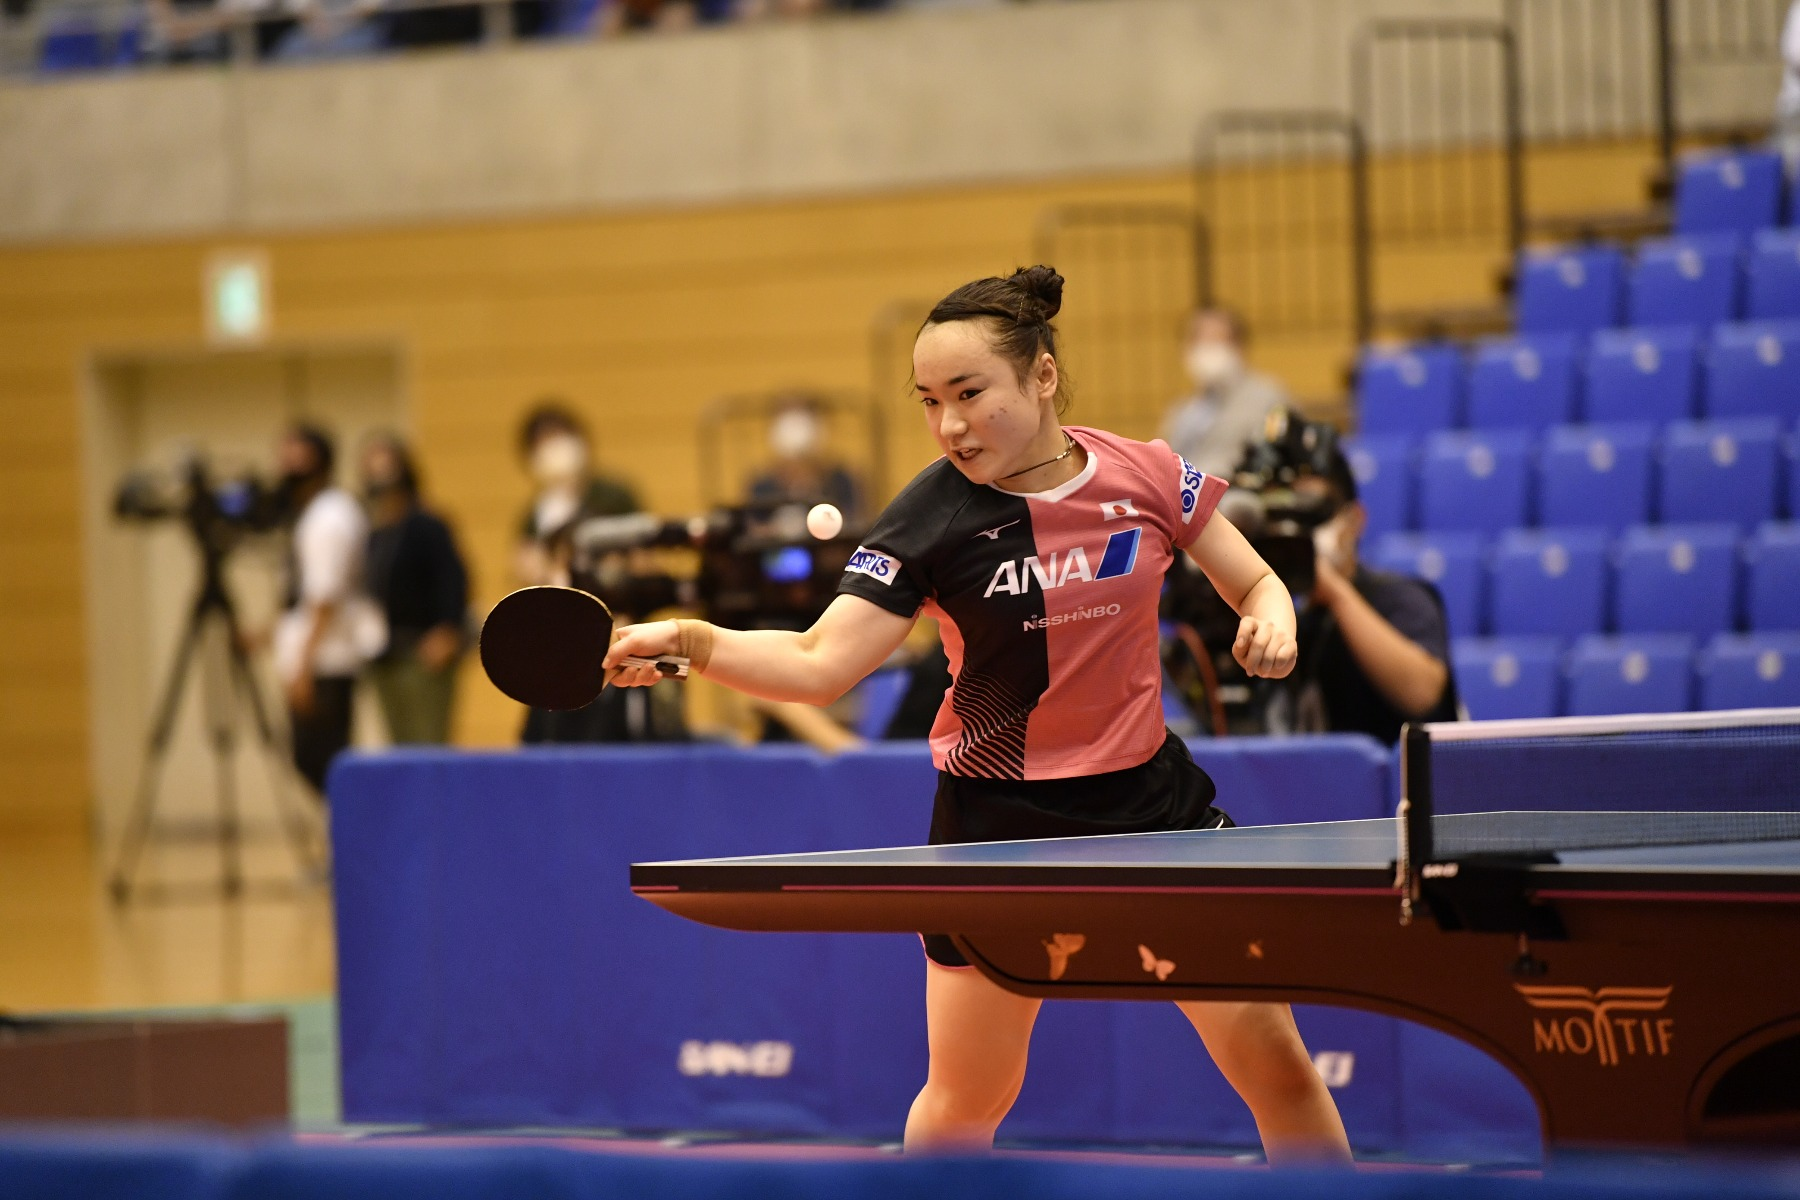 VICTAS VICTAS JOURNAL 卓球 TリーグVICTAS ヴィクタス VICTAS PLAY ヴィクタスプレイ 卓球 VICTAS JOURNAL 東京五輪壮行試合、2021卓球NIPPONドリームマッチ女子は、日本代表が5-0の快勝。